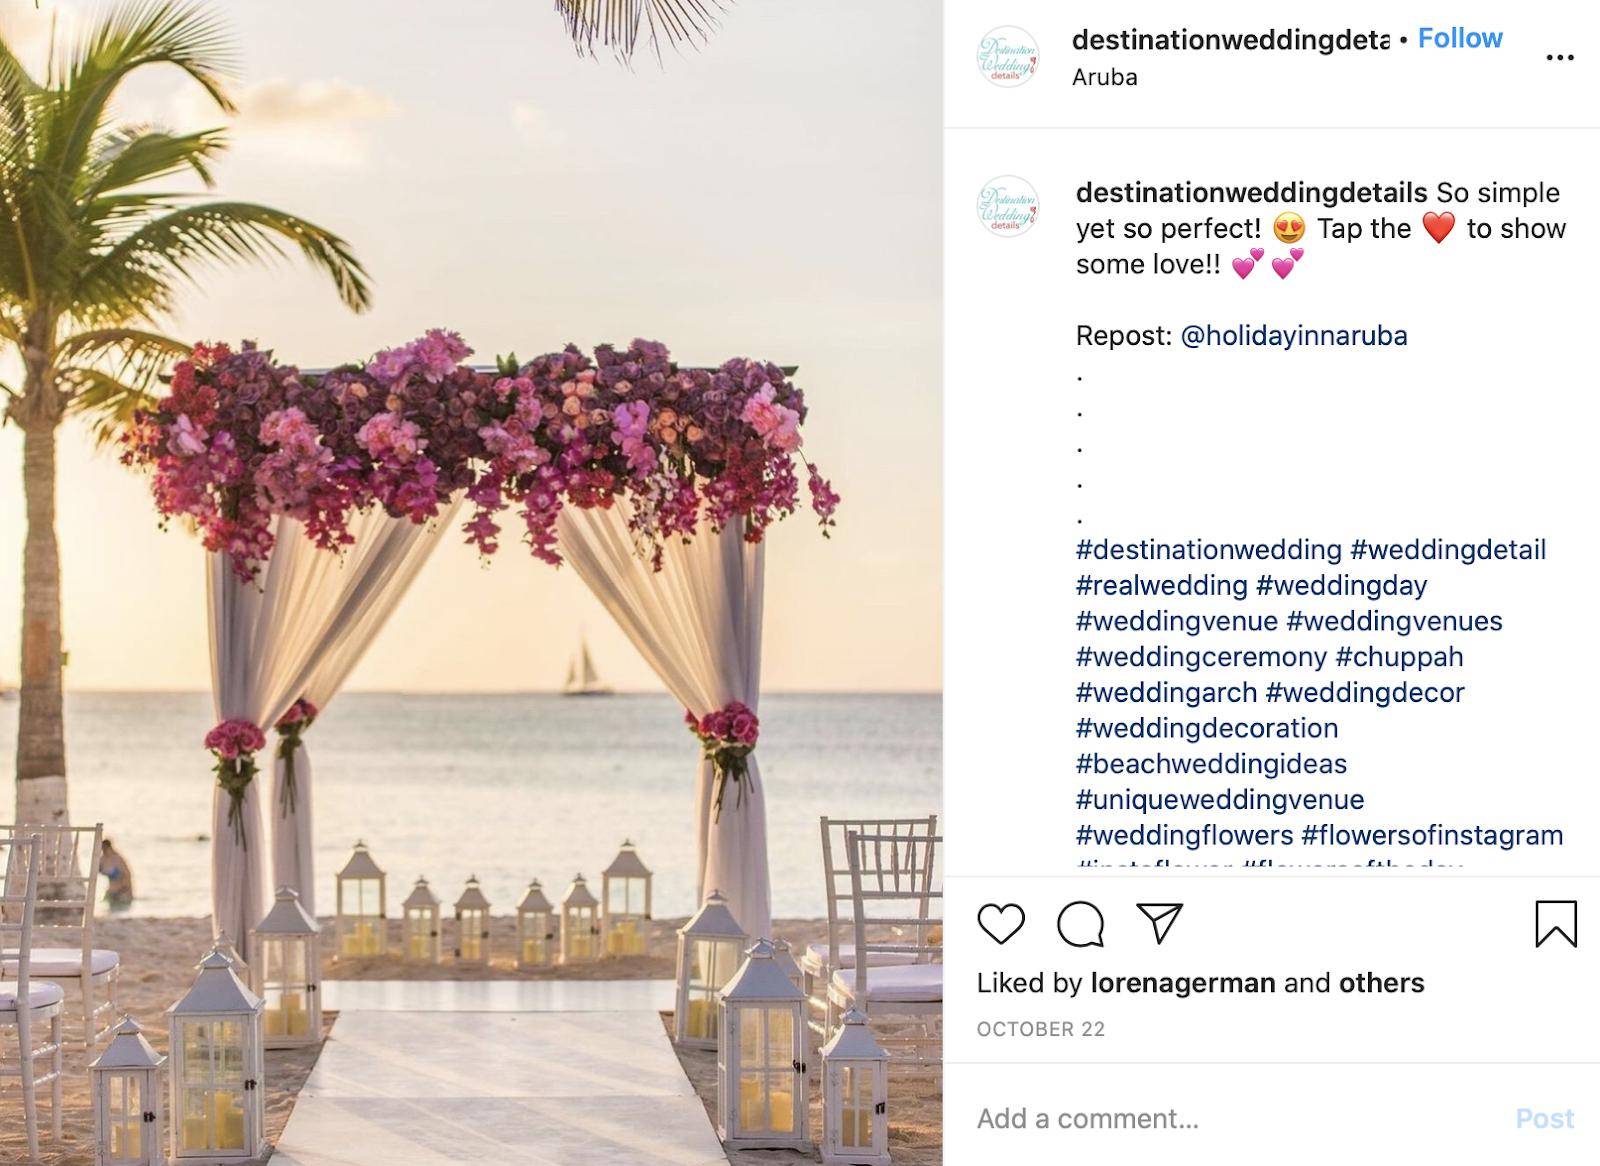 wedding structure on a beach